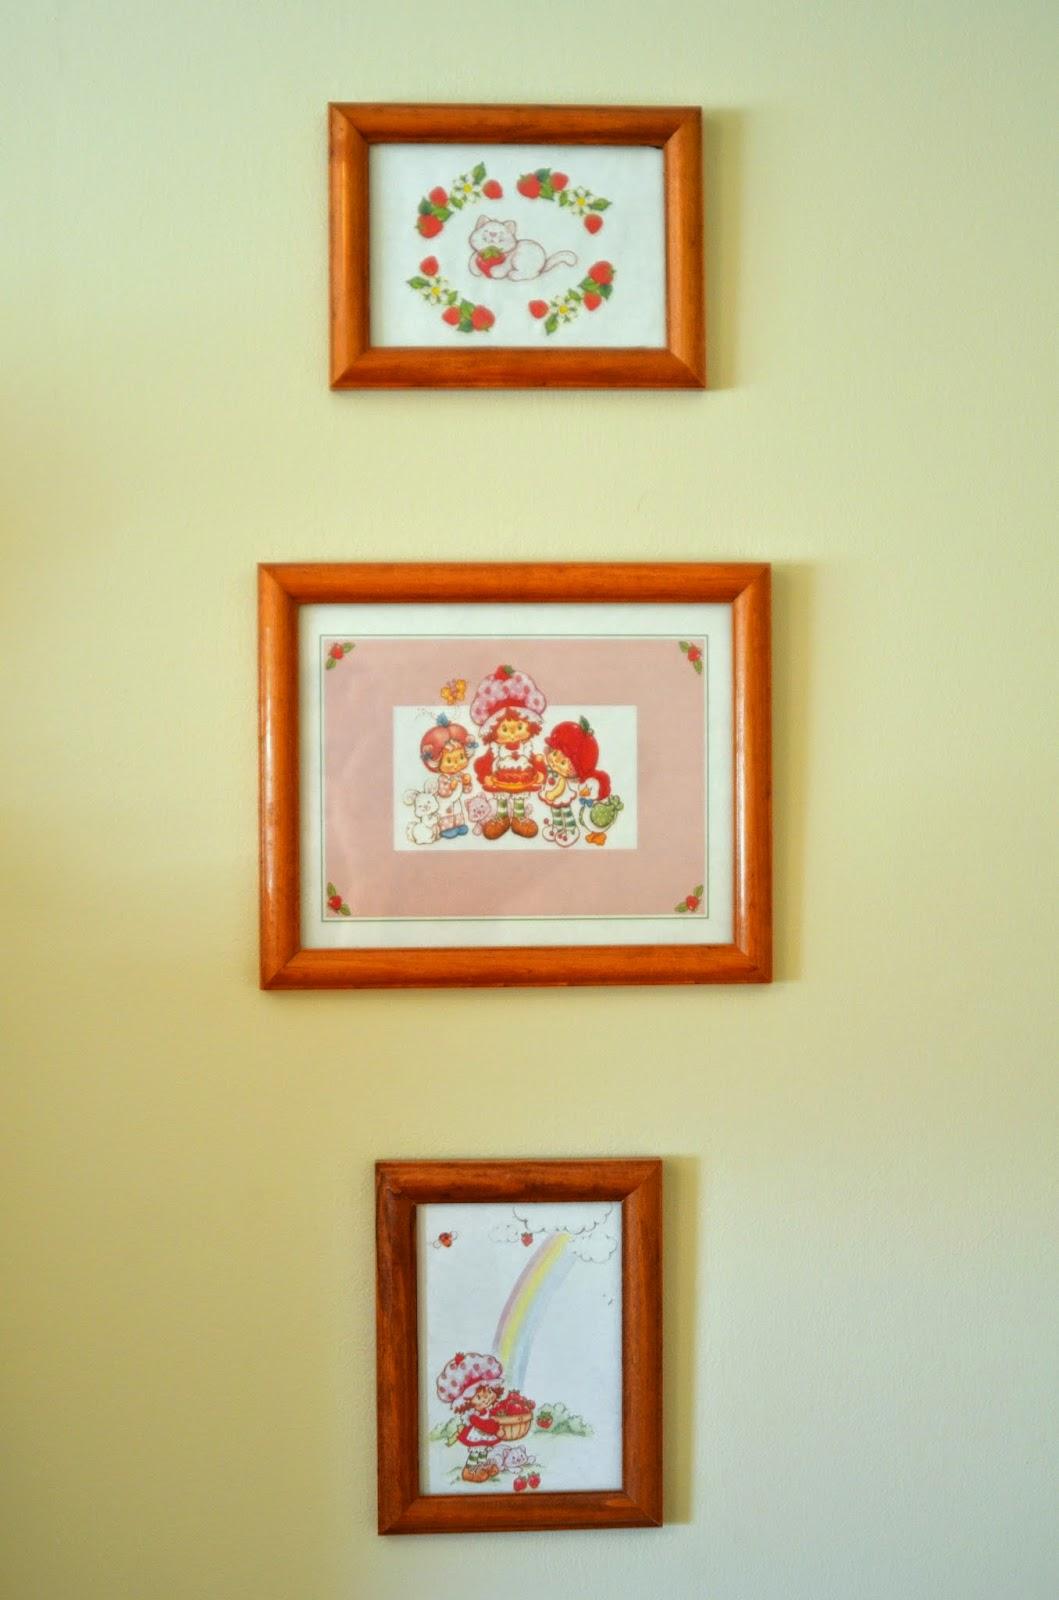 The Imaginative Seamstress: My Strawberry Room